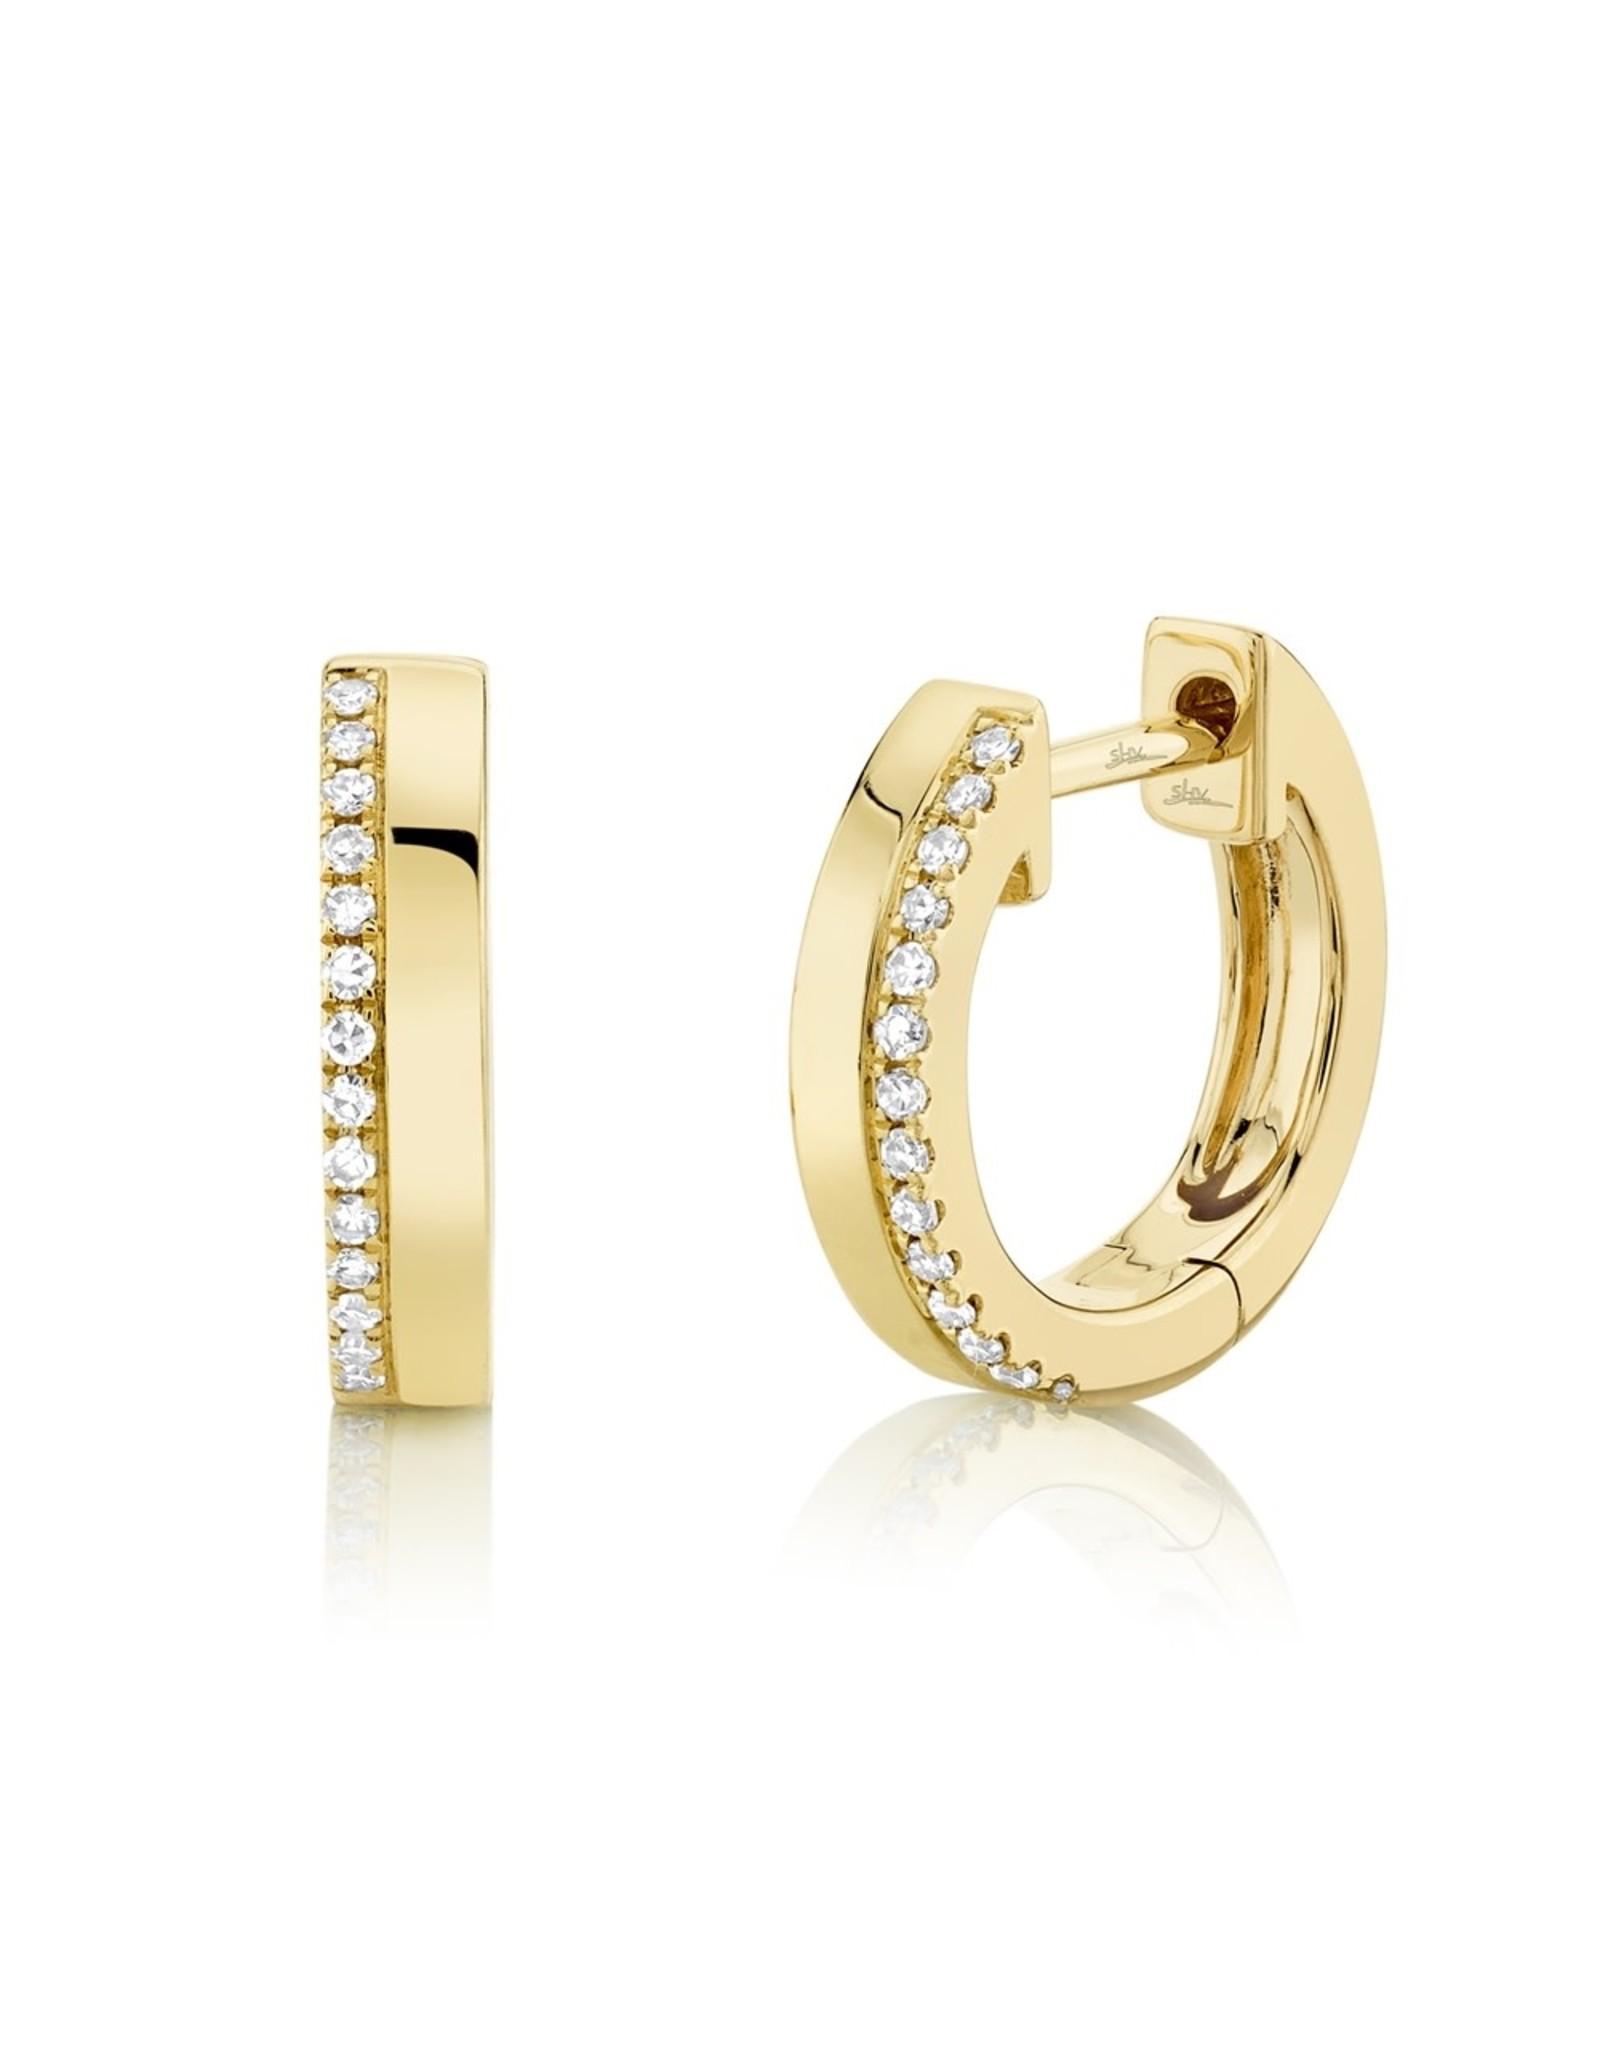 14K Yellow Gold Diamond Huggie Earrings, D: 0.08ct